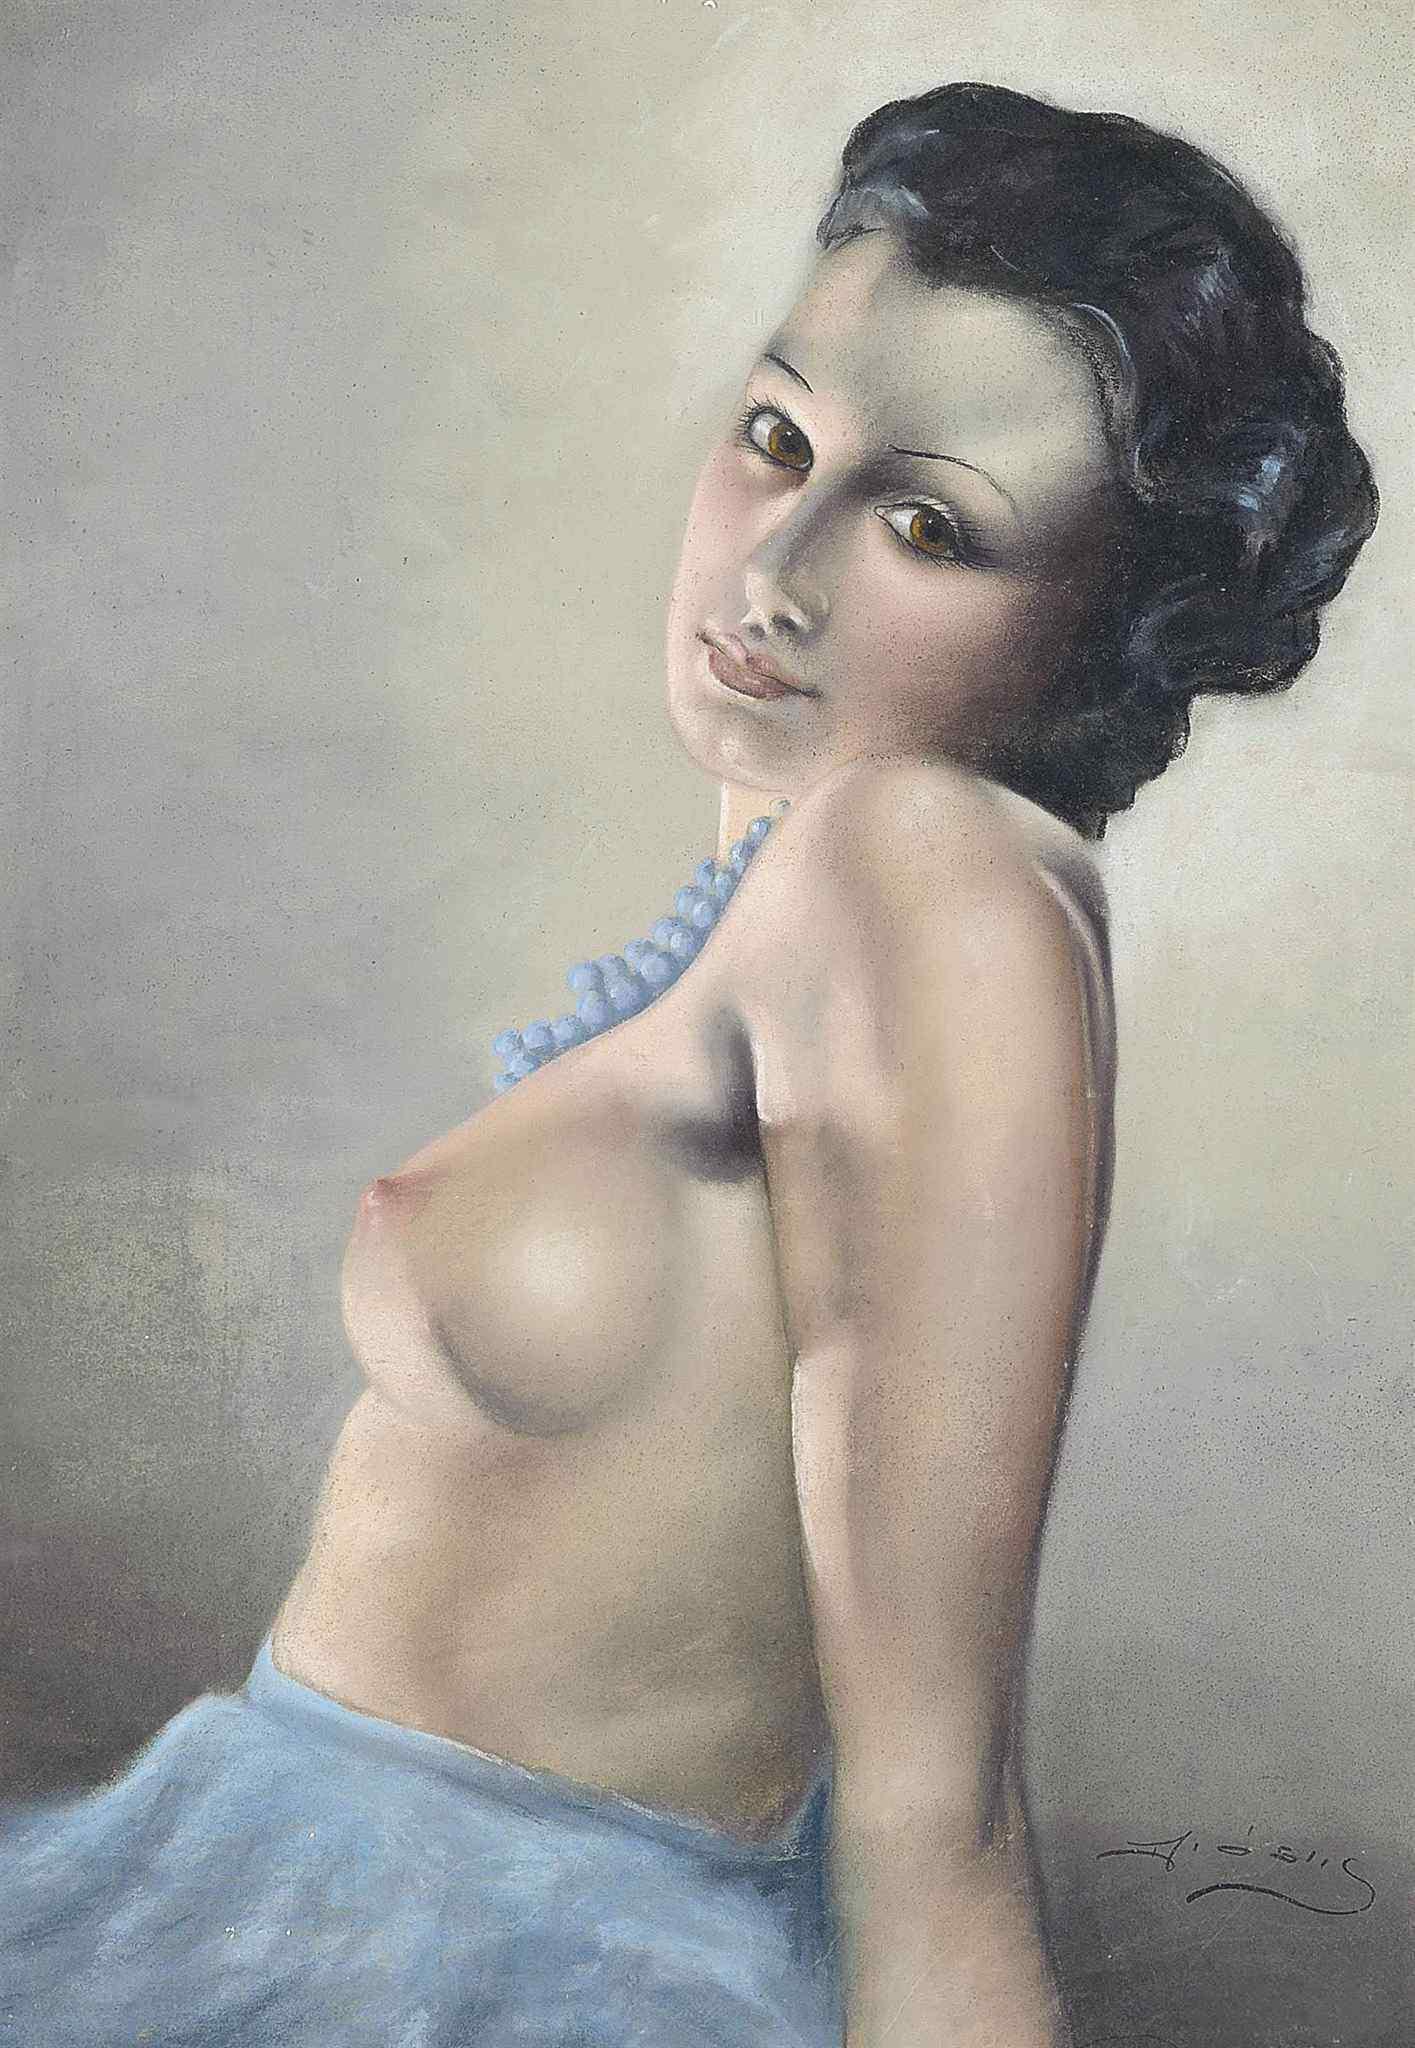 Antal Diosy, 1895-1977. Юная красавица. 68.6 x 49 см. Частная коллекция